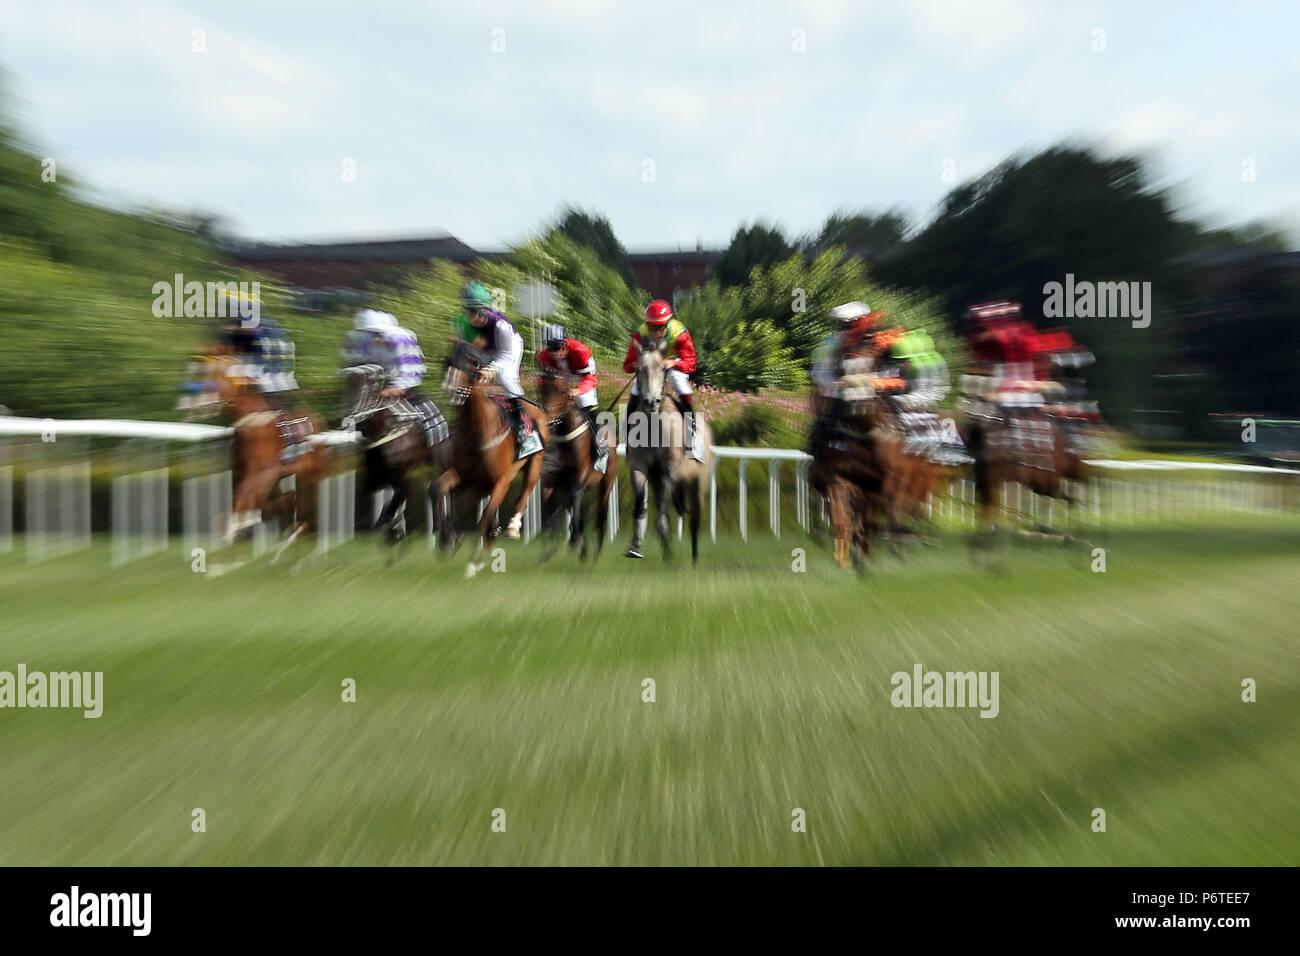 Amburgo, dynamics, cavalli e fantini in gara Immagini Stock